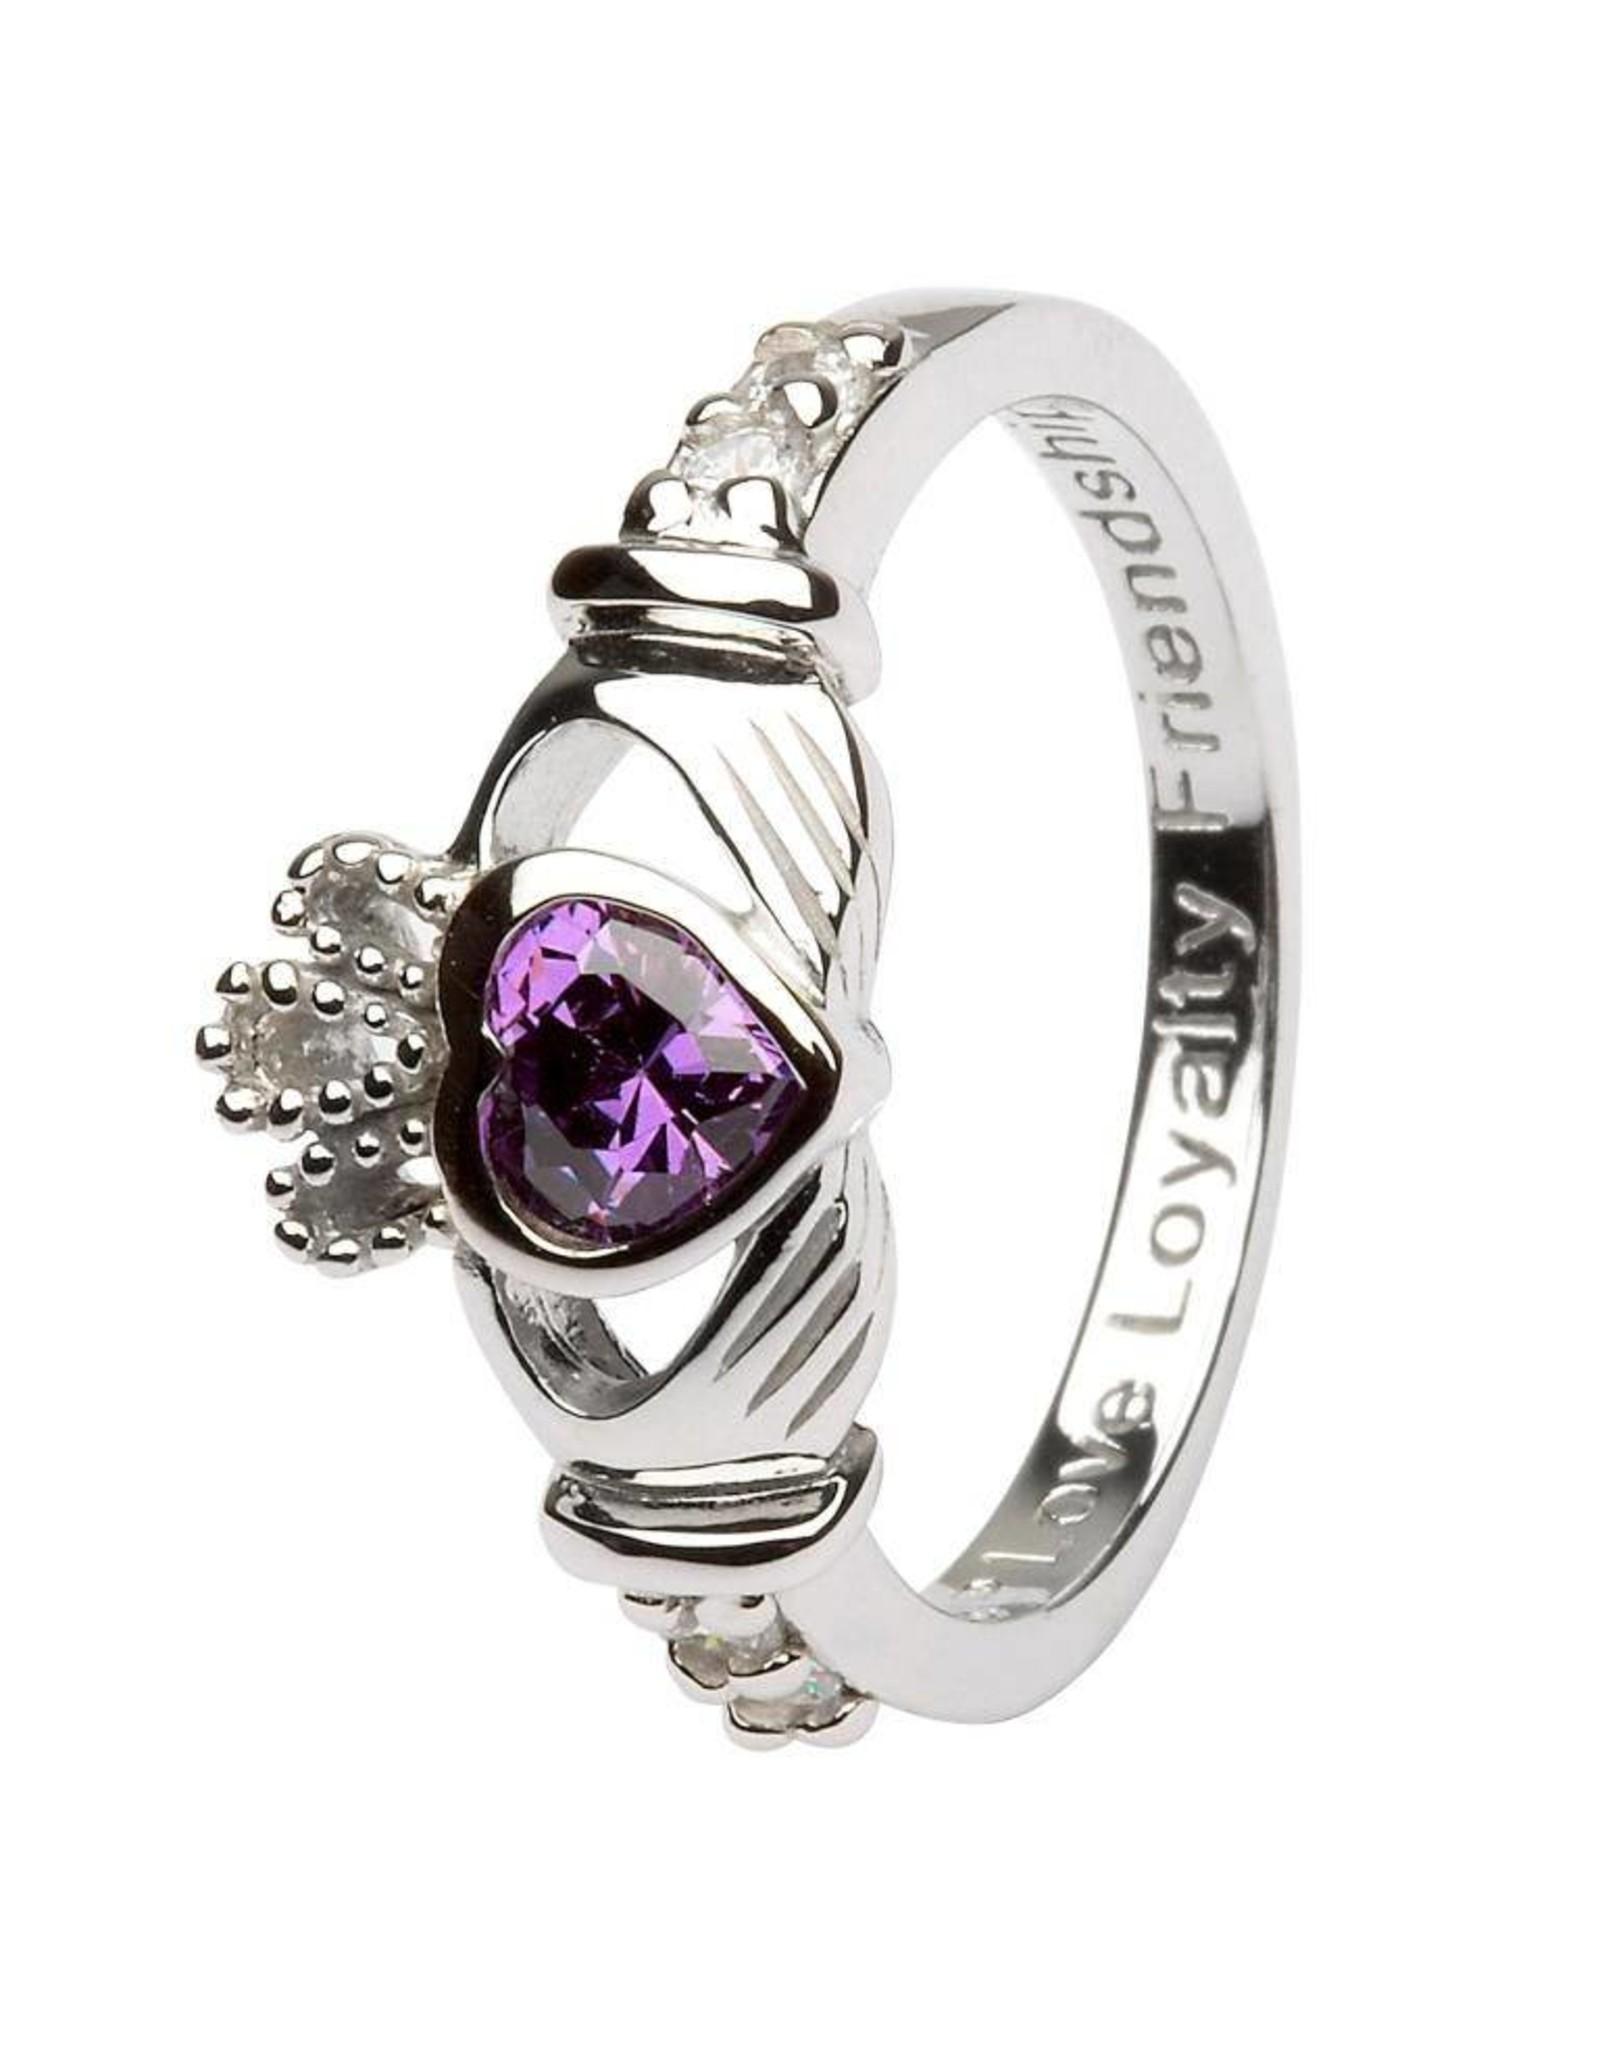 Shanore February Birthstone Claddagh Ring